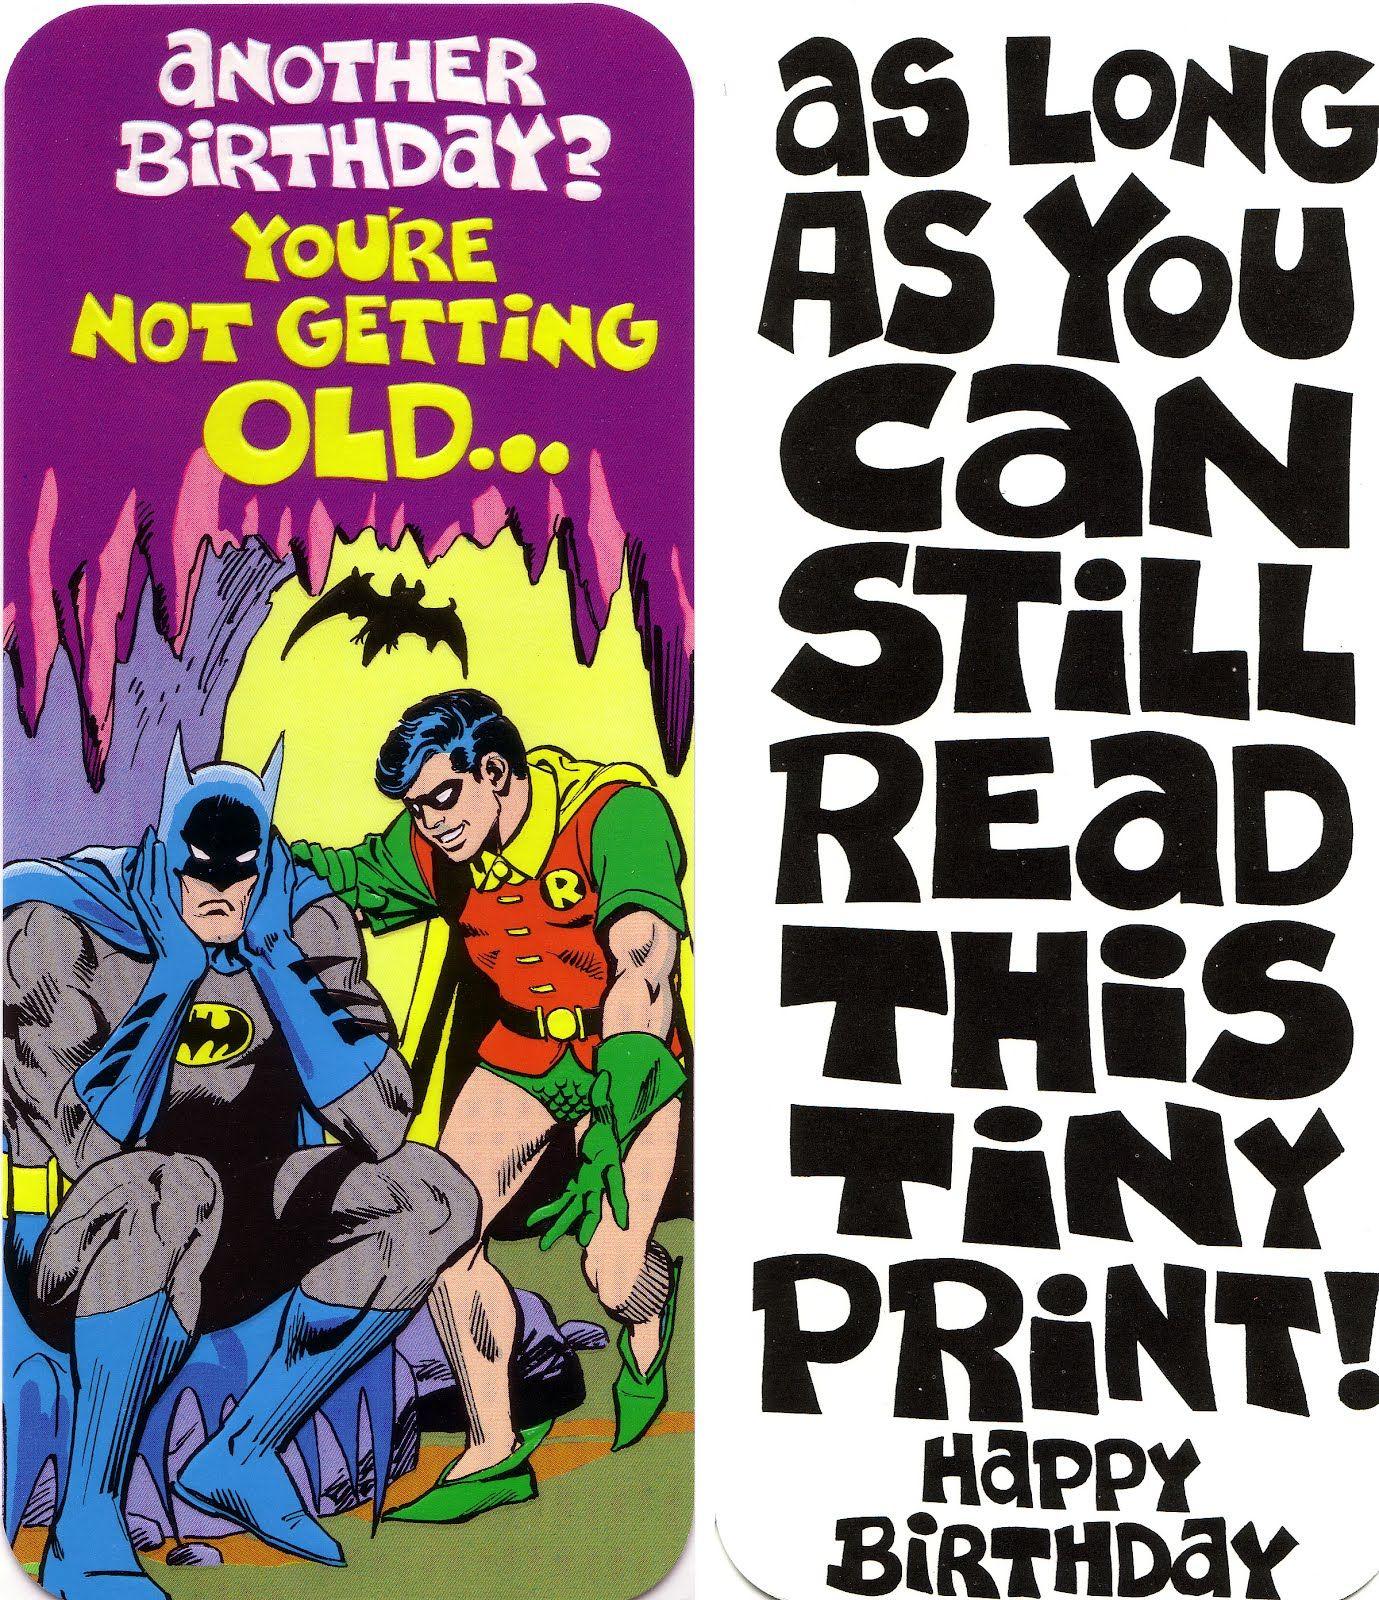 Batmanbirthdaycardg 13791600 batman smink esk pinterest batmanbirthdaycardg 13791600 batman birthday quotescard bookmarktalkfo Gallery